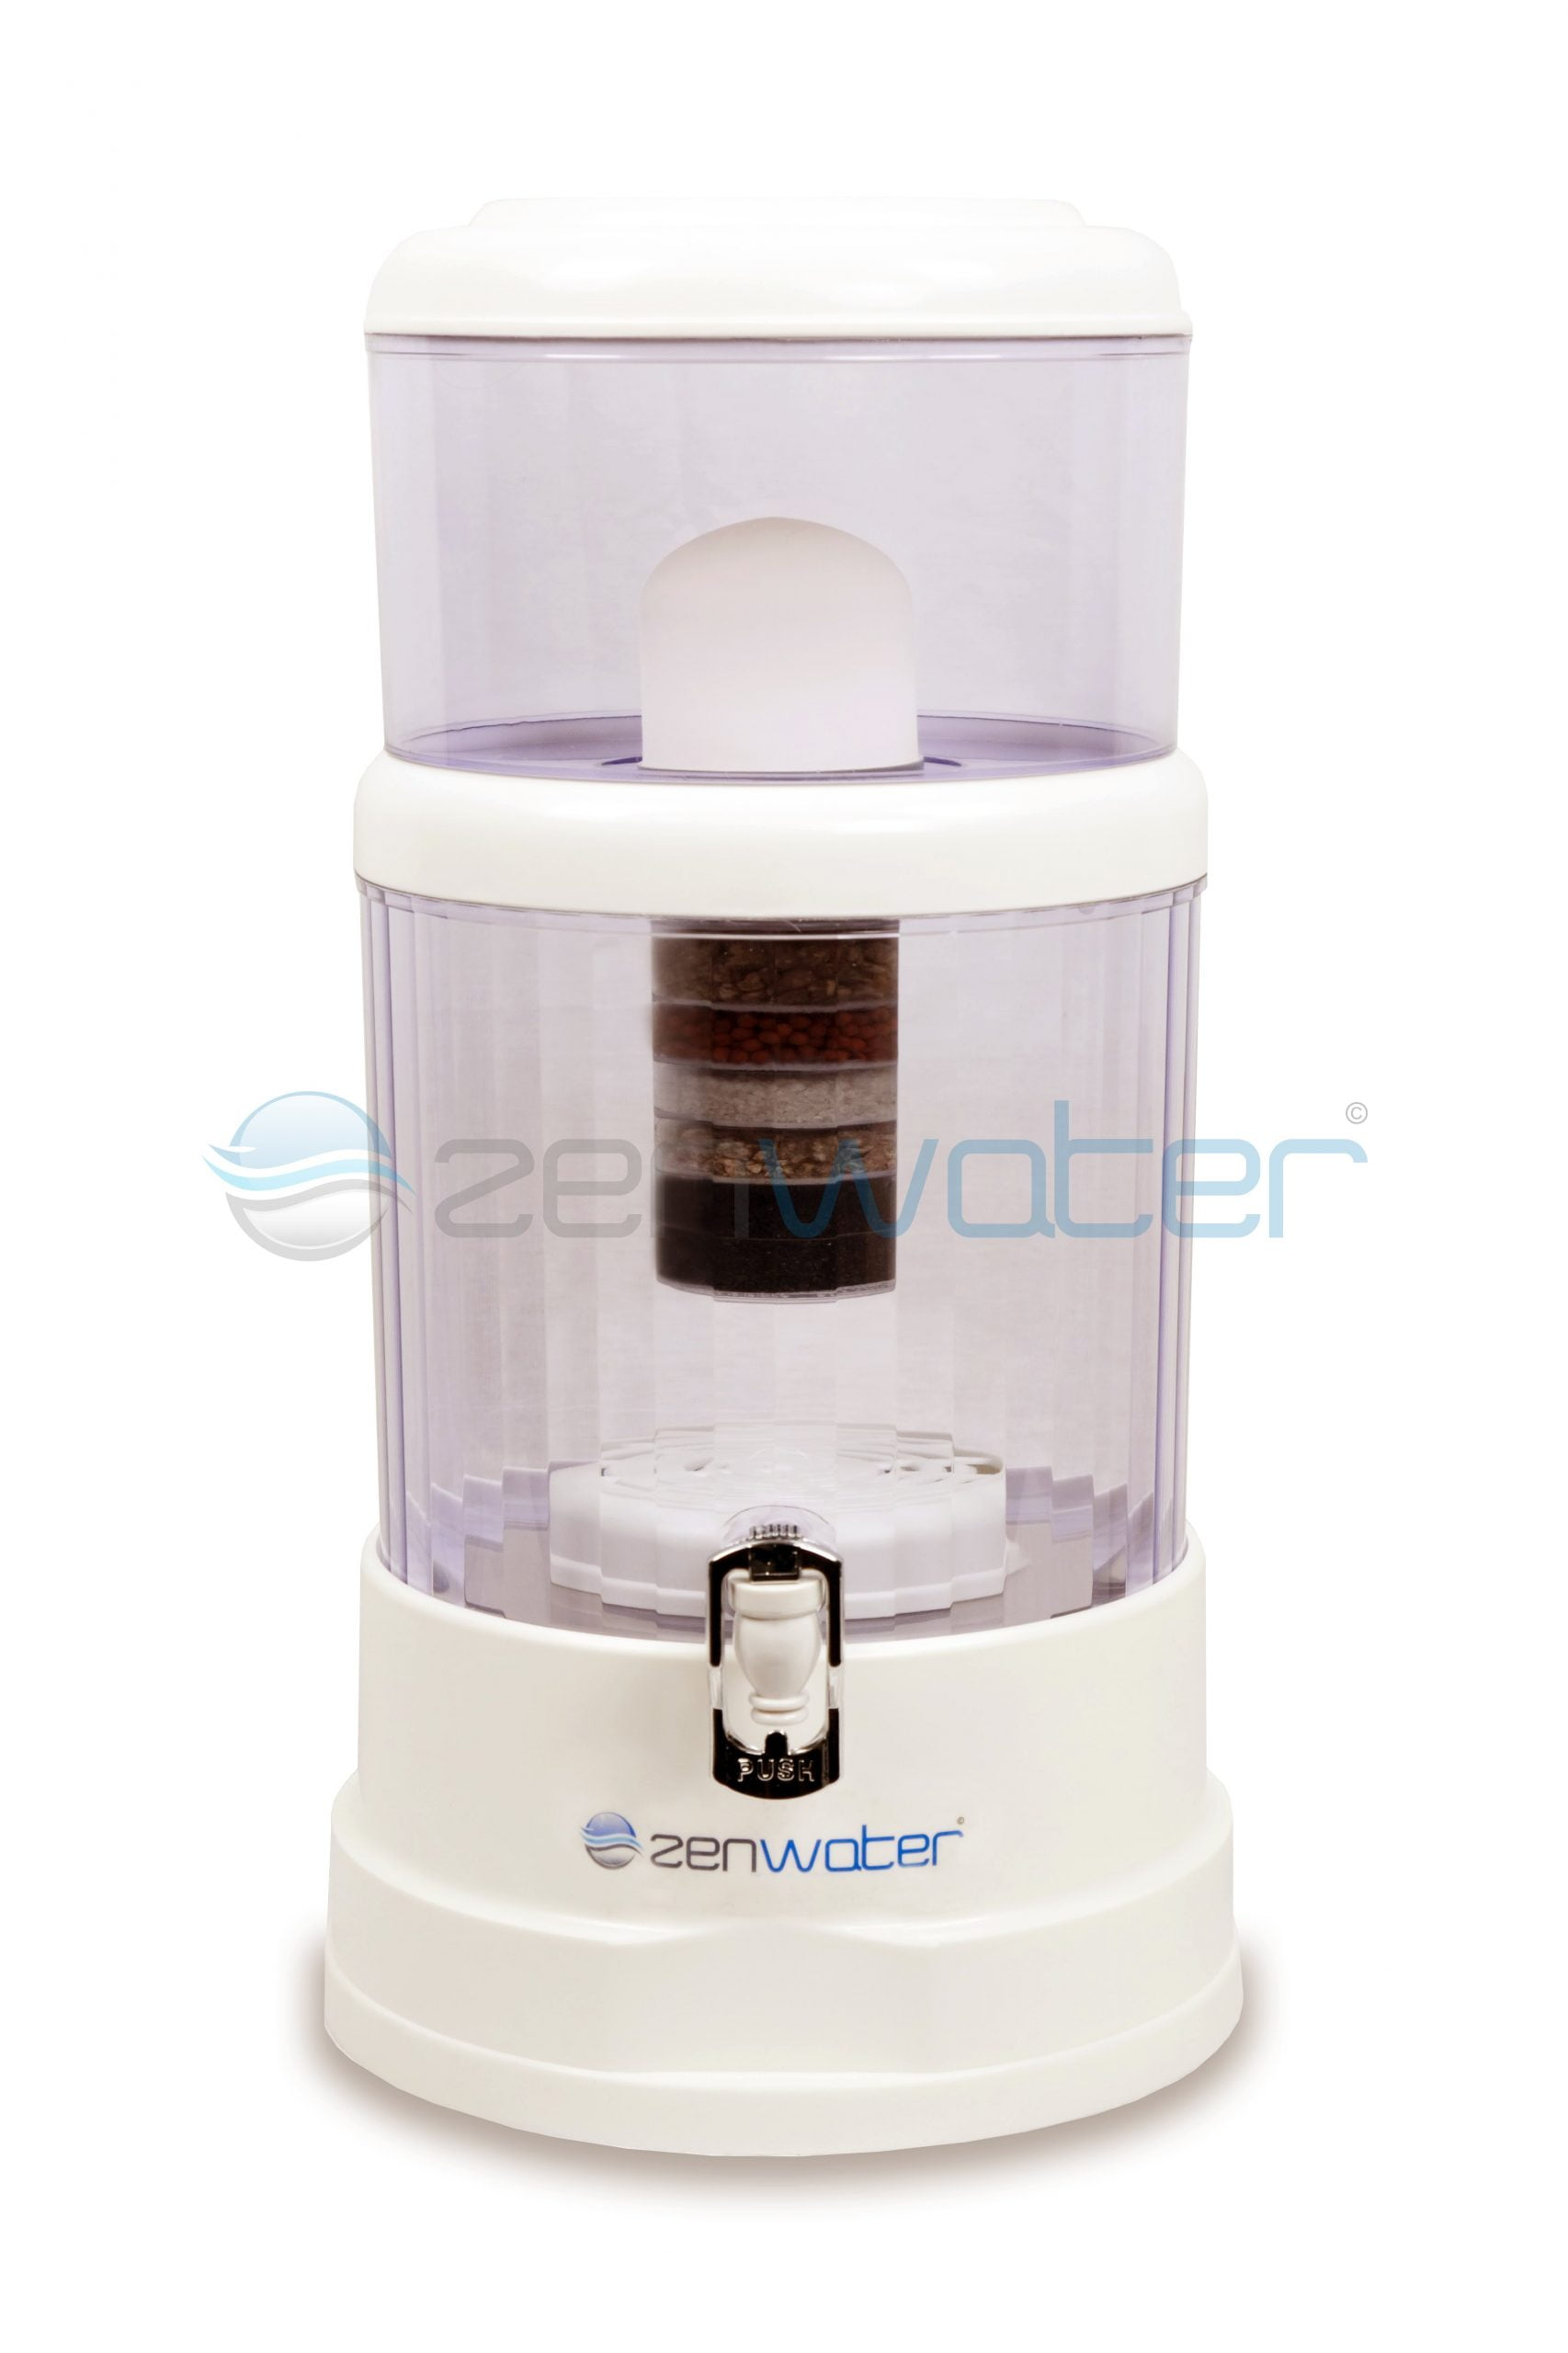 Rejuvenate – 6-Gallon Countertop Water Filter & Purifier